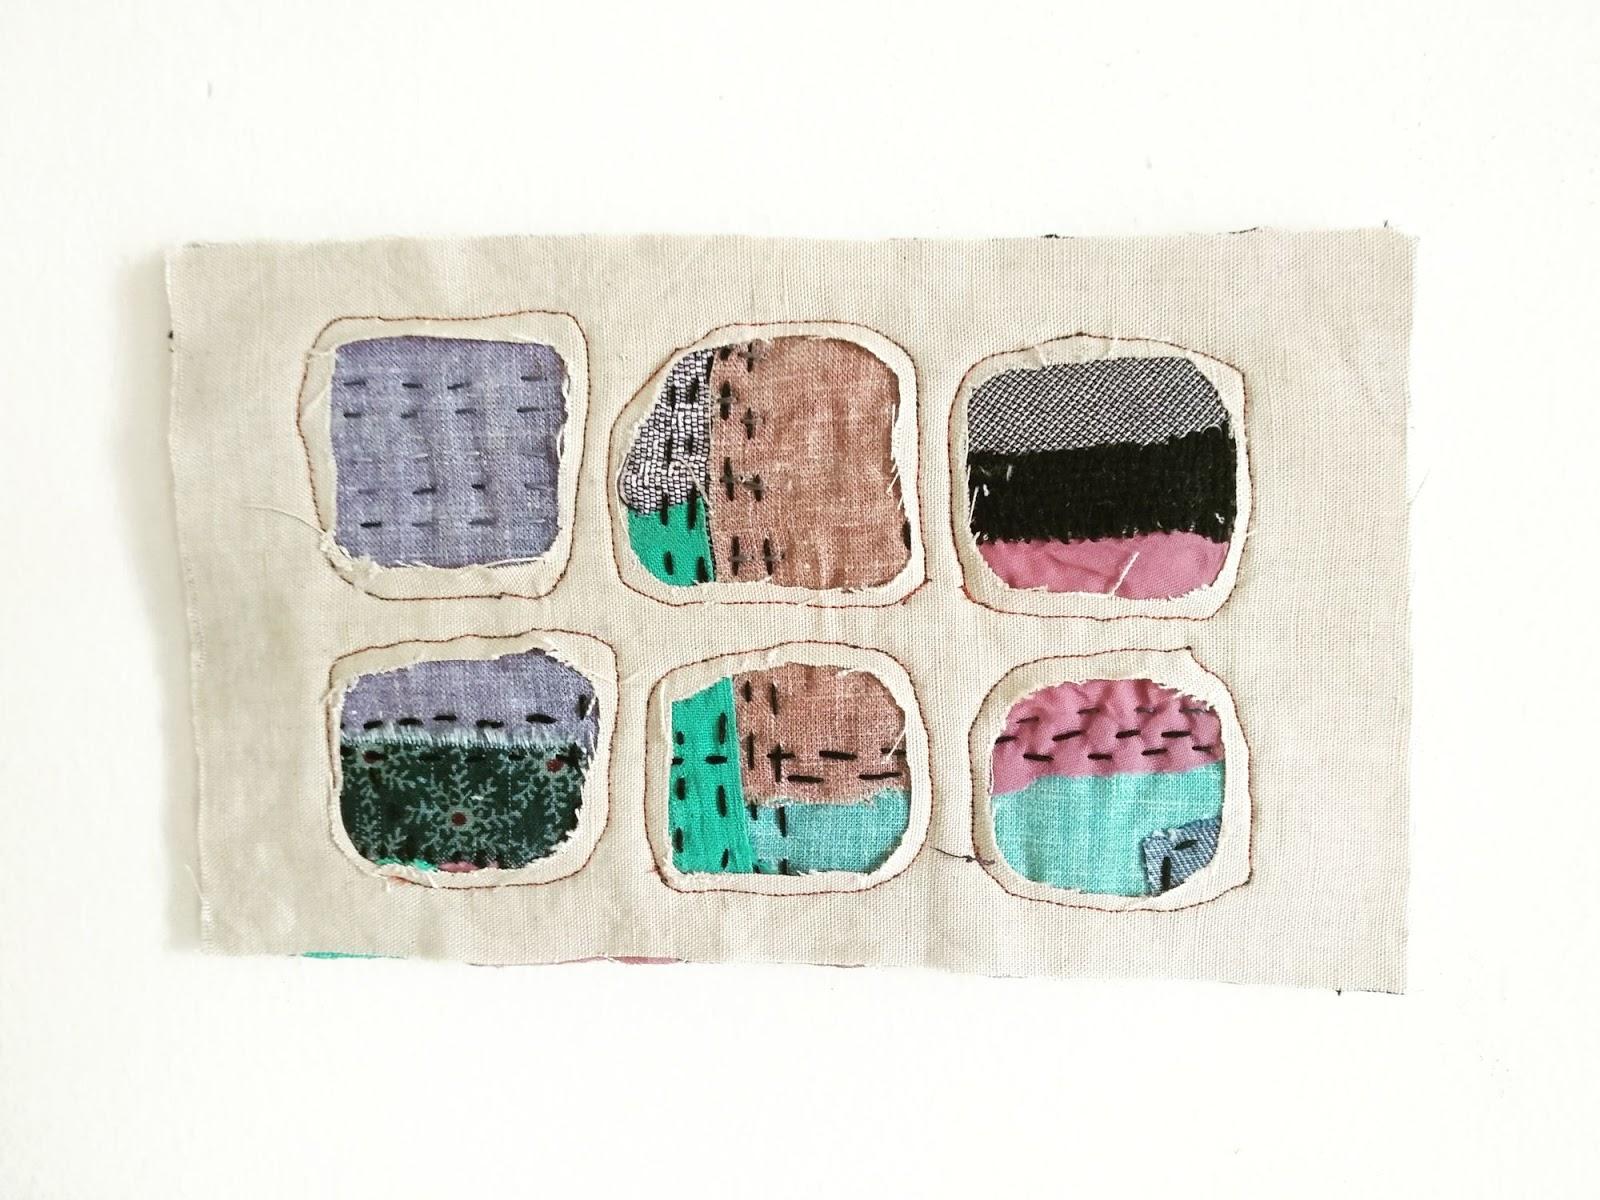 Interpreting Mending - A Series of Postcards Part 2